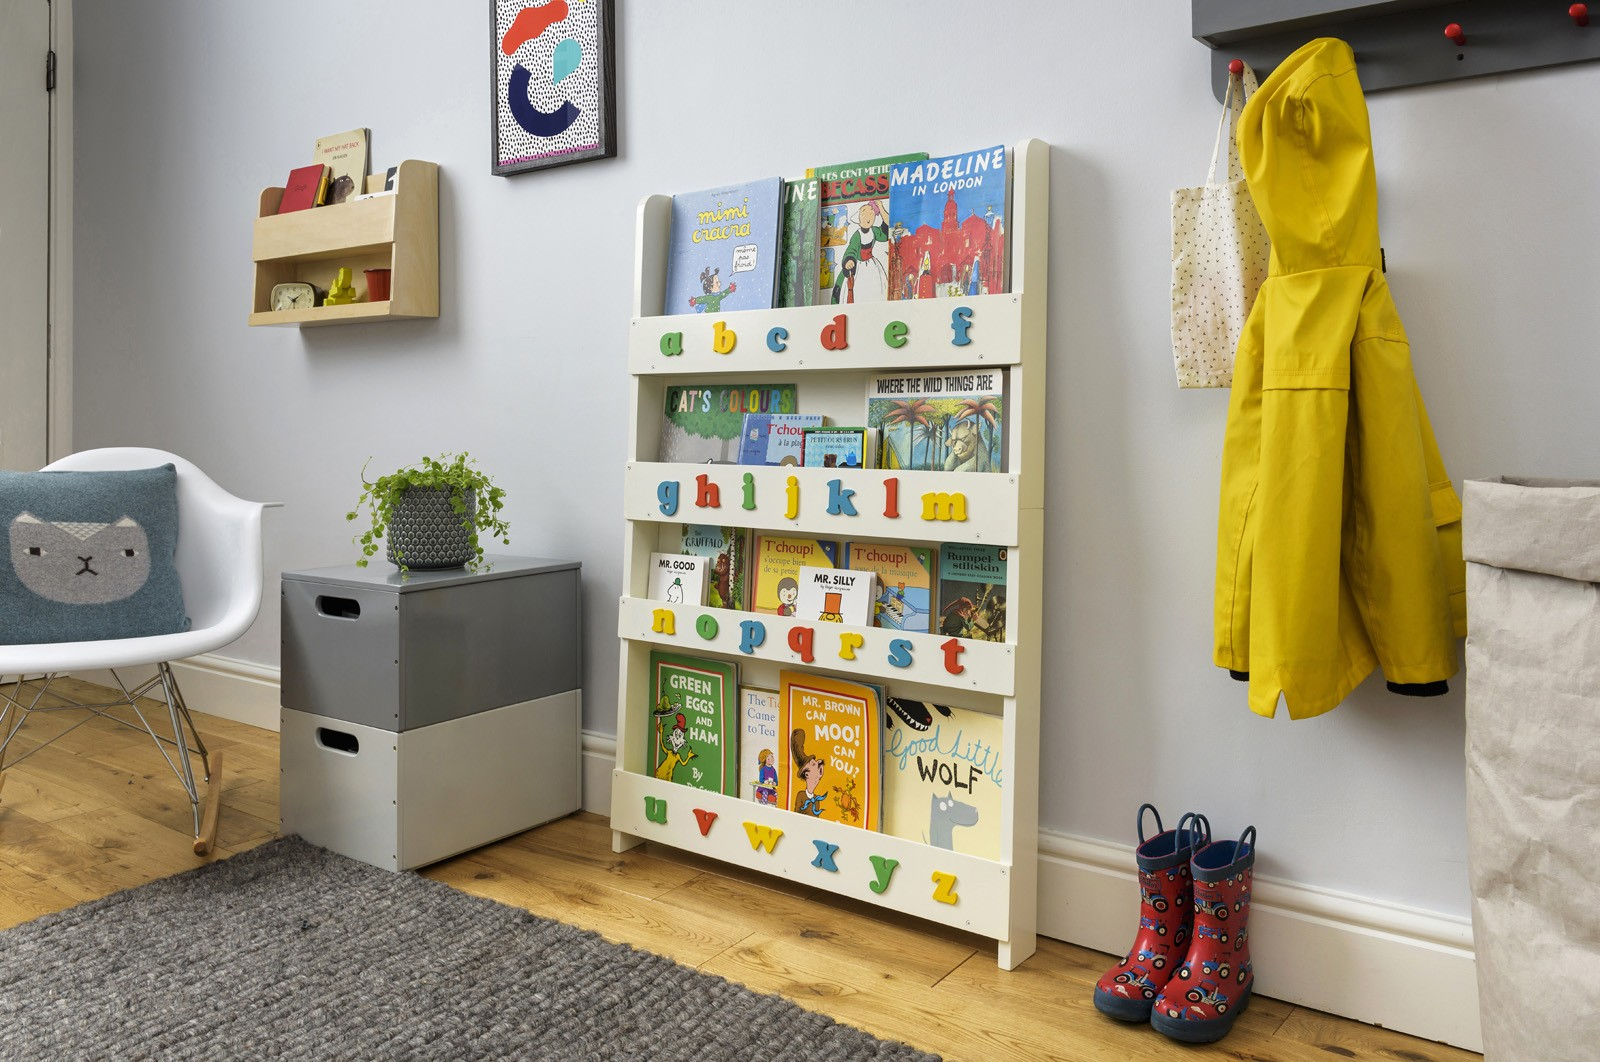 Full Size of Kinderzimmer Bücherregal Tidy Books Bcherregale Originales Preisgekrntes Sortiment Regal Sofa Regale Weiß Kinderzimmer Kinderzimmer Bücherregal